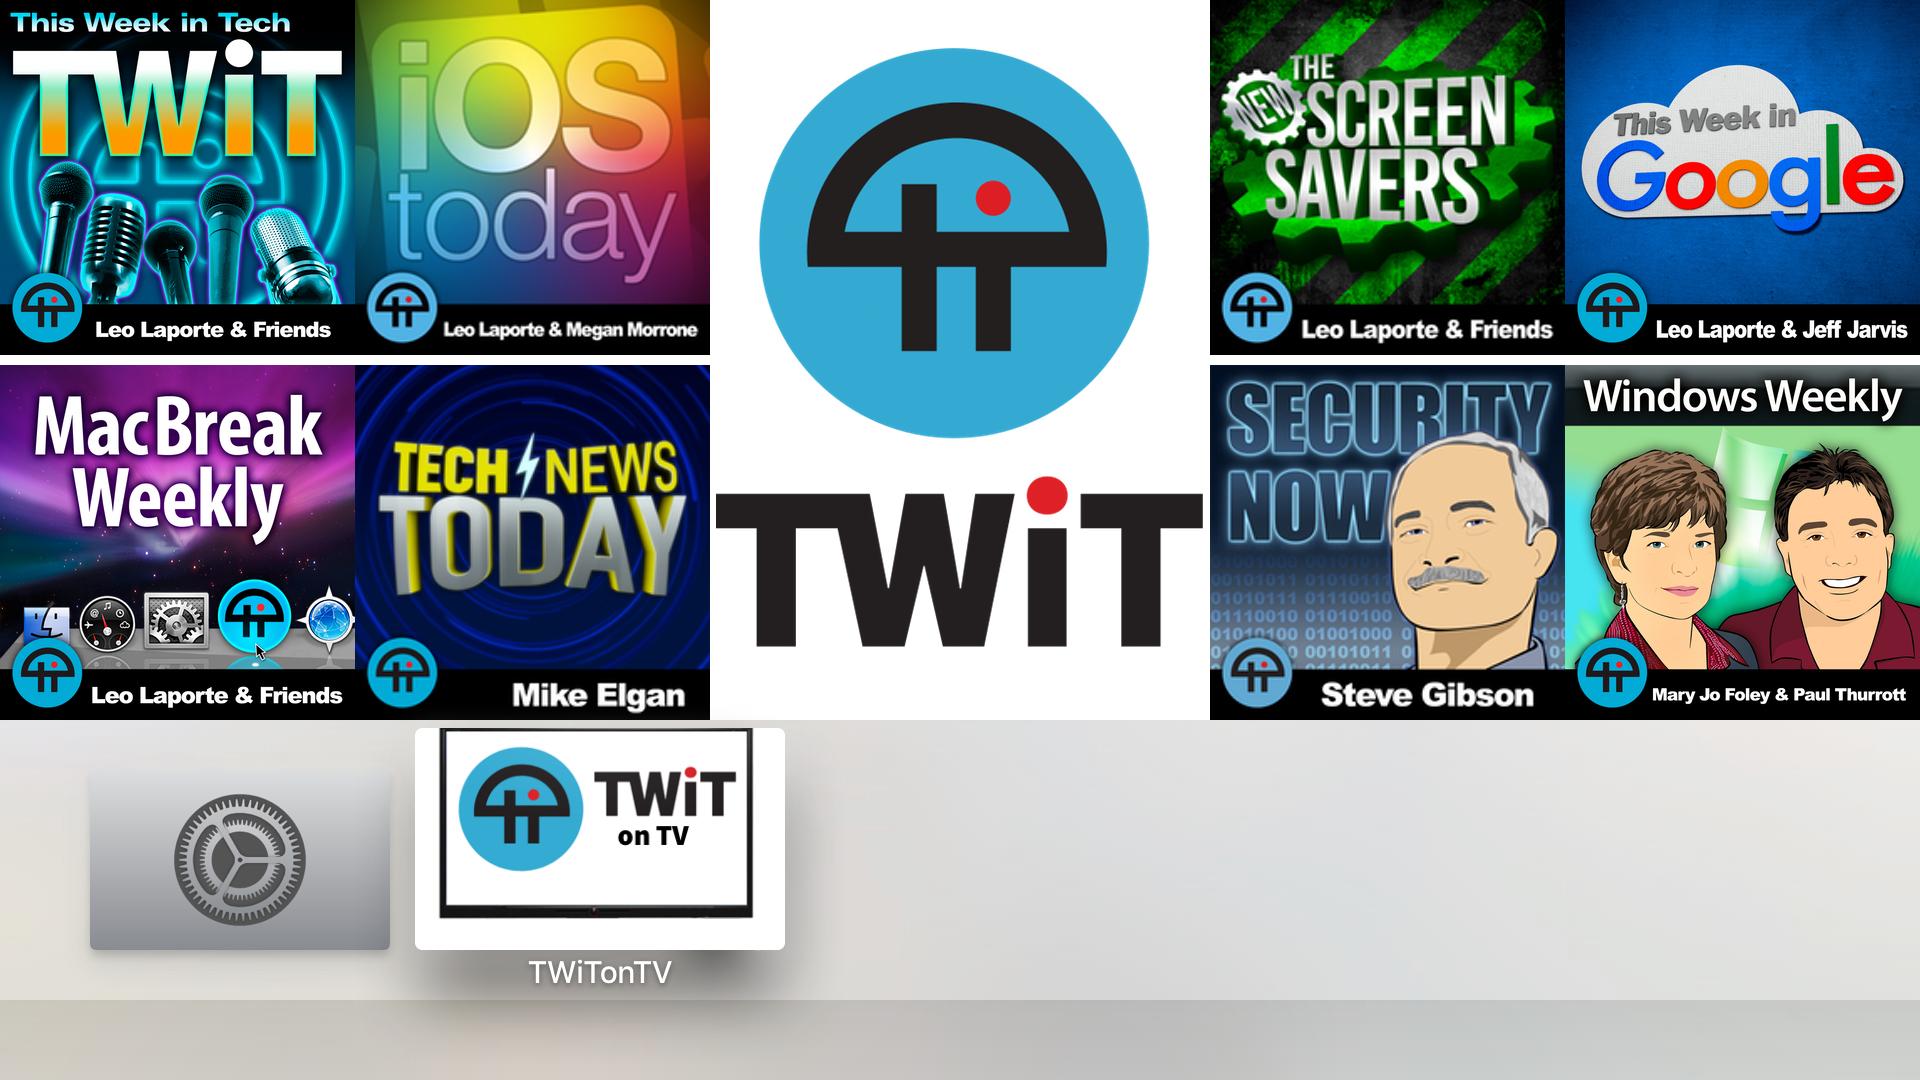 TWiT on TV screenshot 1